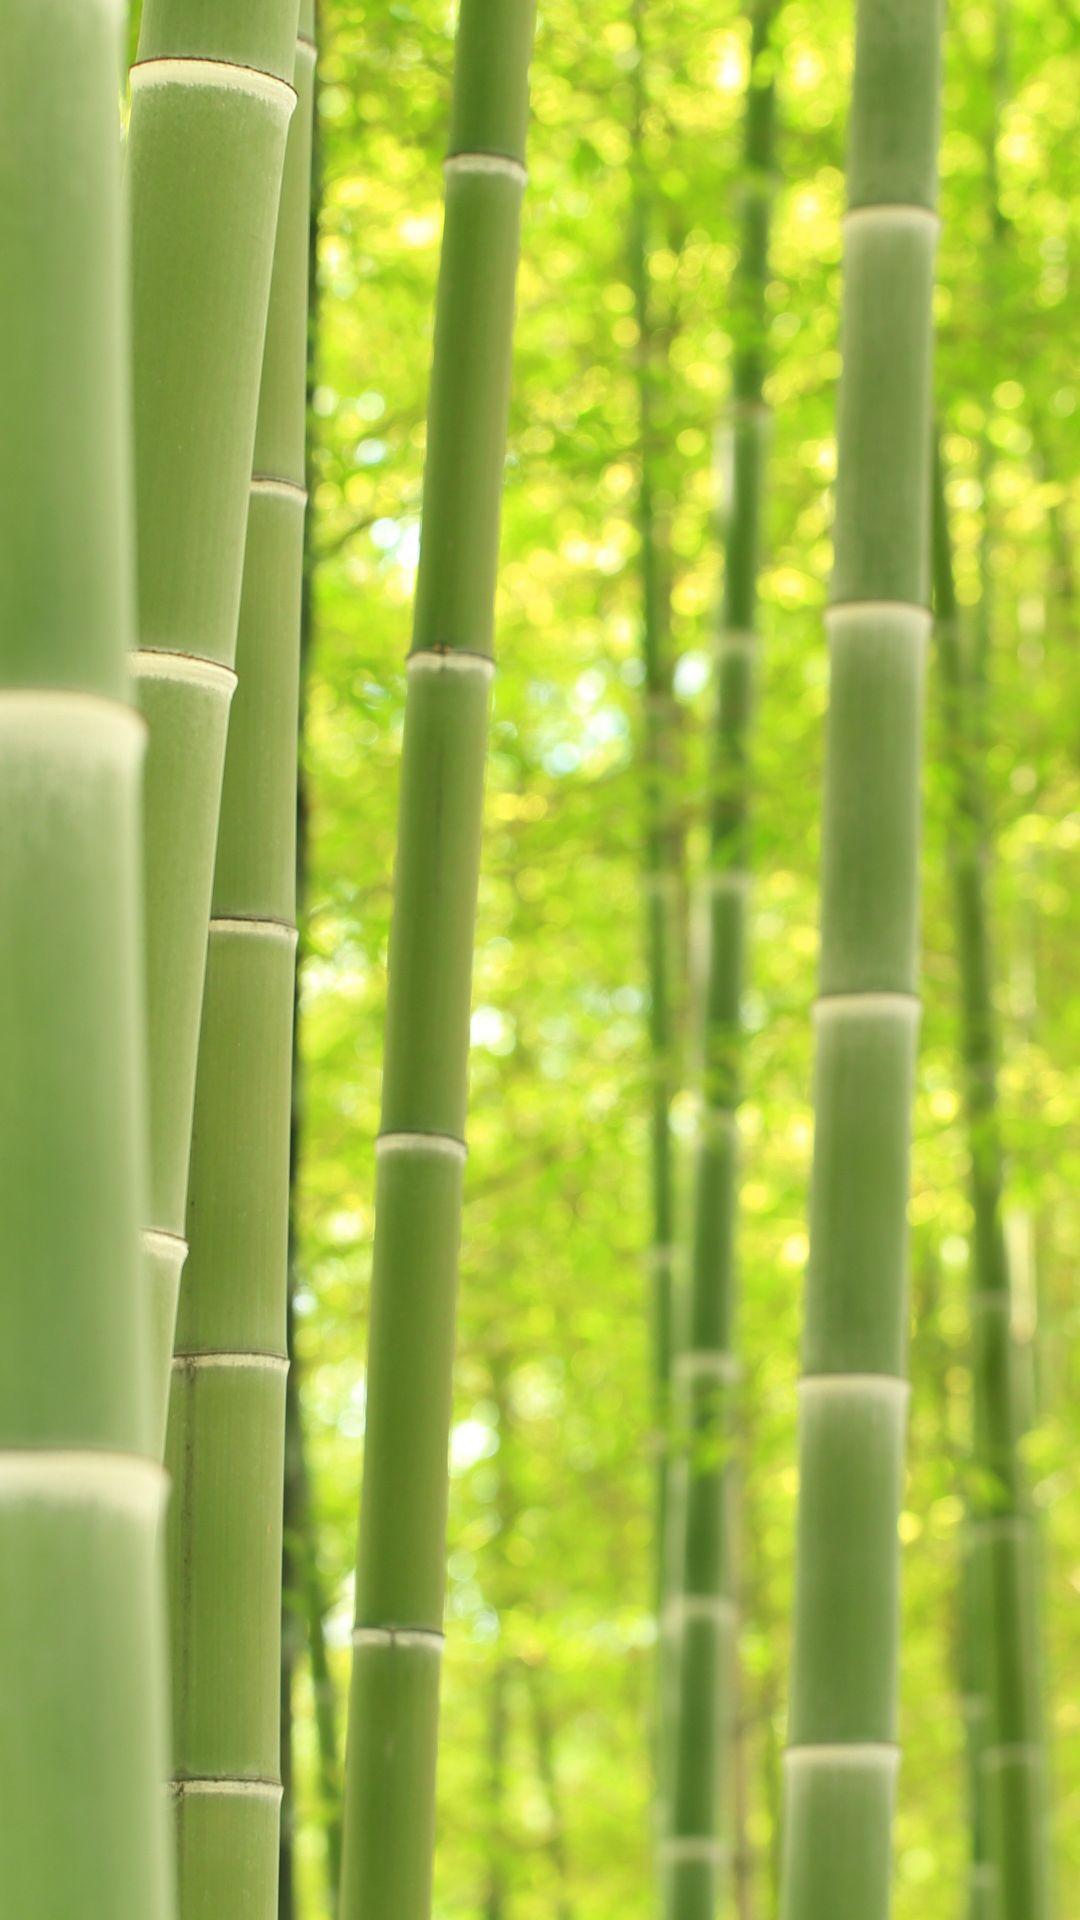 Bamboo Wallpaper Hd : bamboo, wallpaper, Bamboo, Wallpapers, Backgrounds, WallpaperAccess